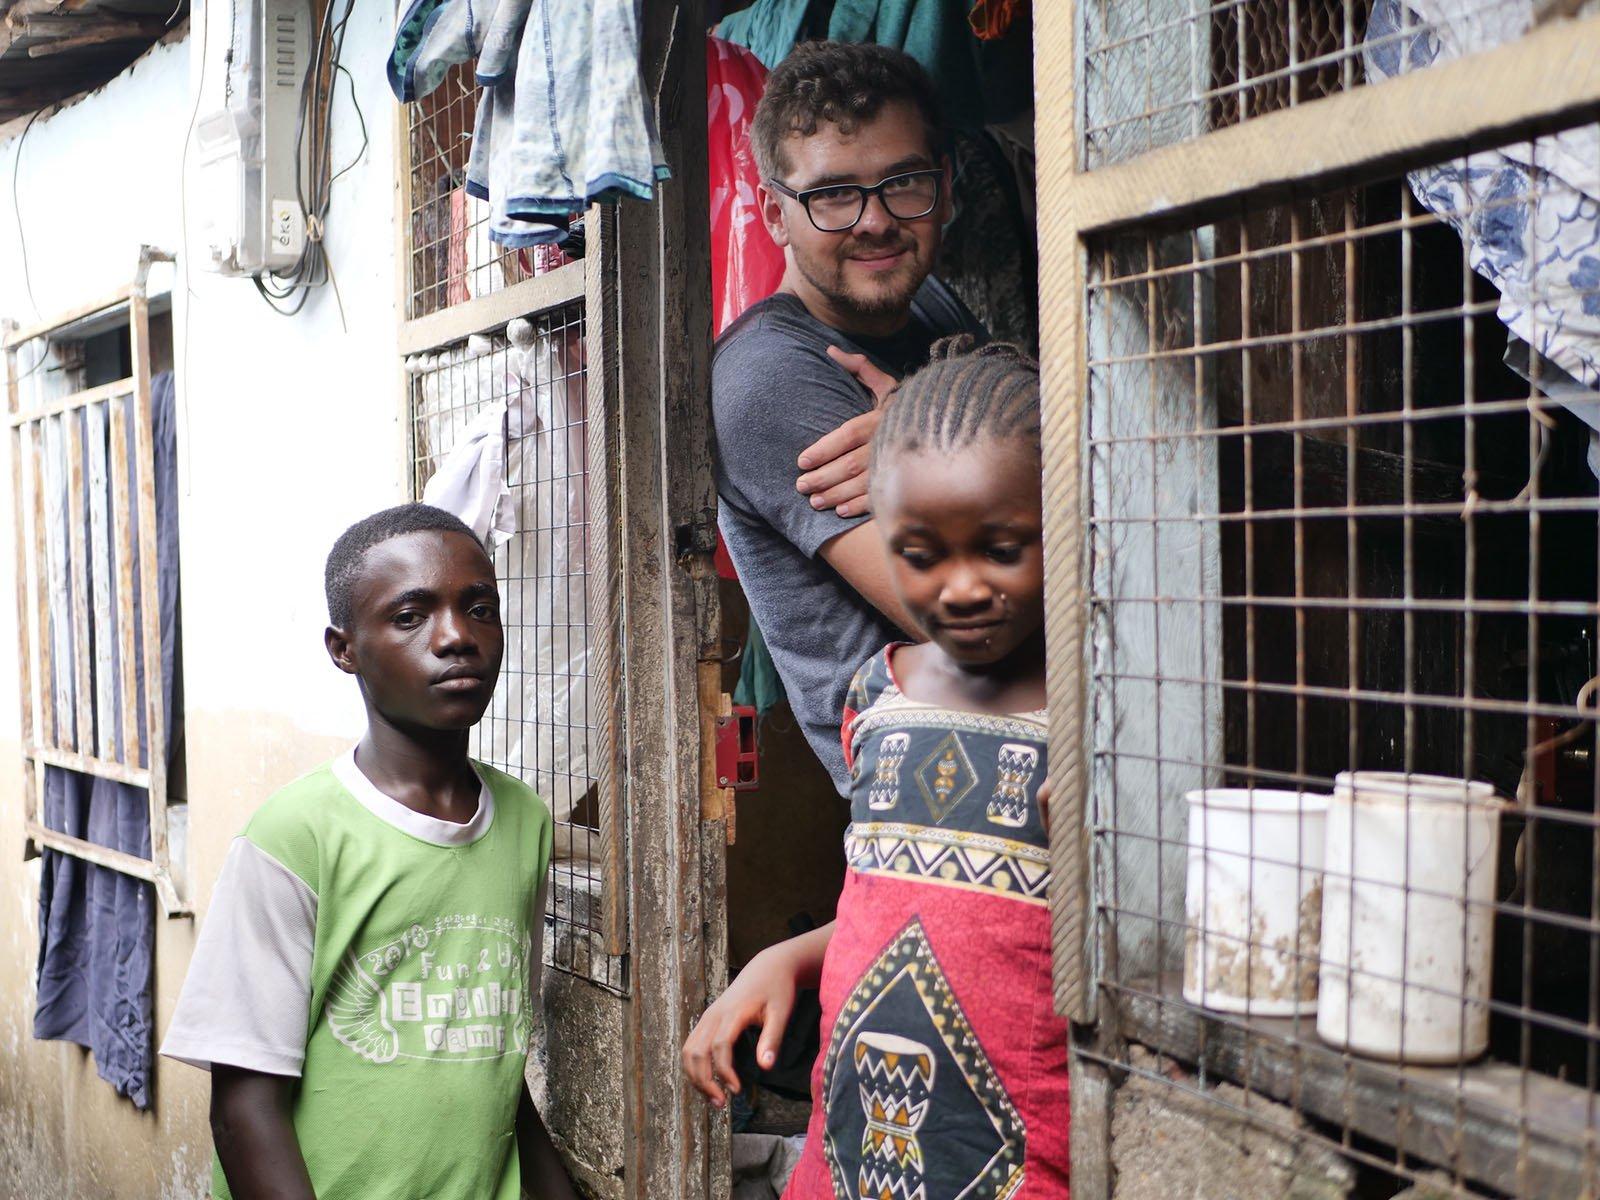 Magazine Wharf slum in Sierra Leone